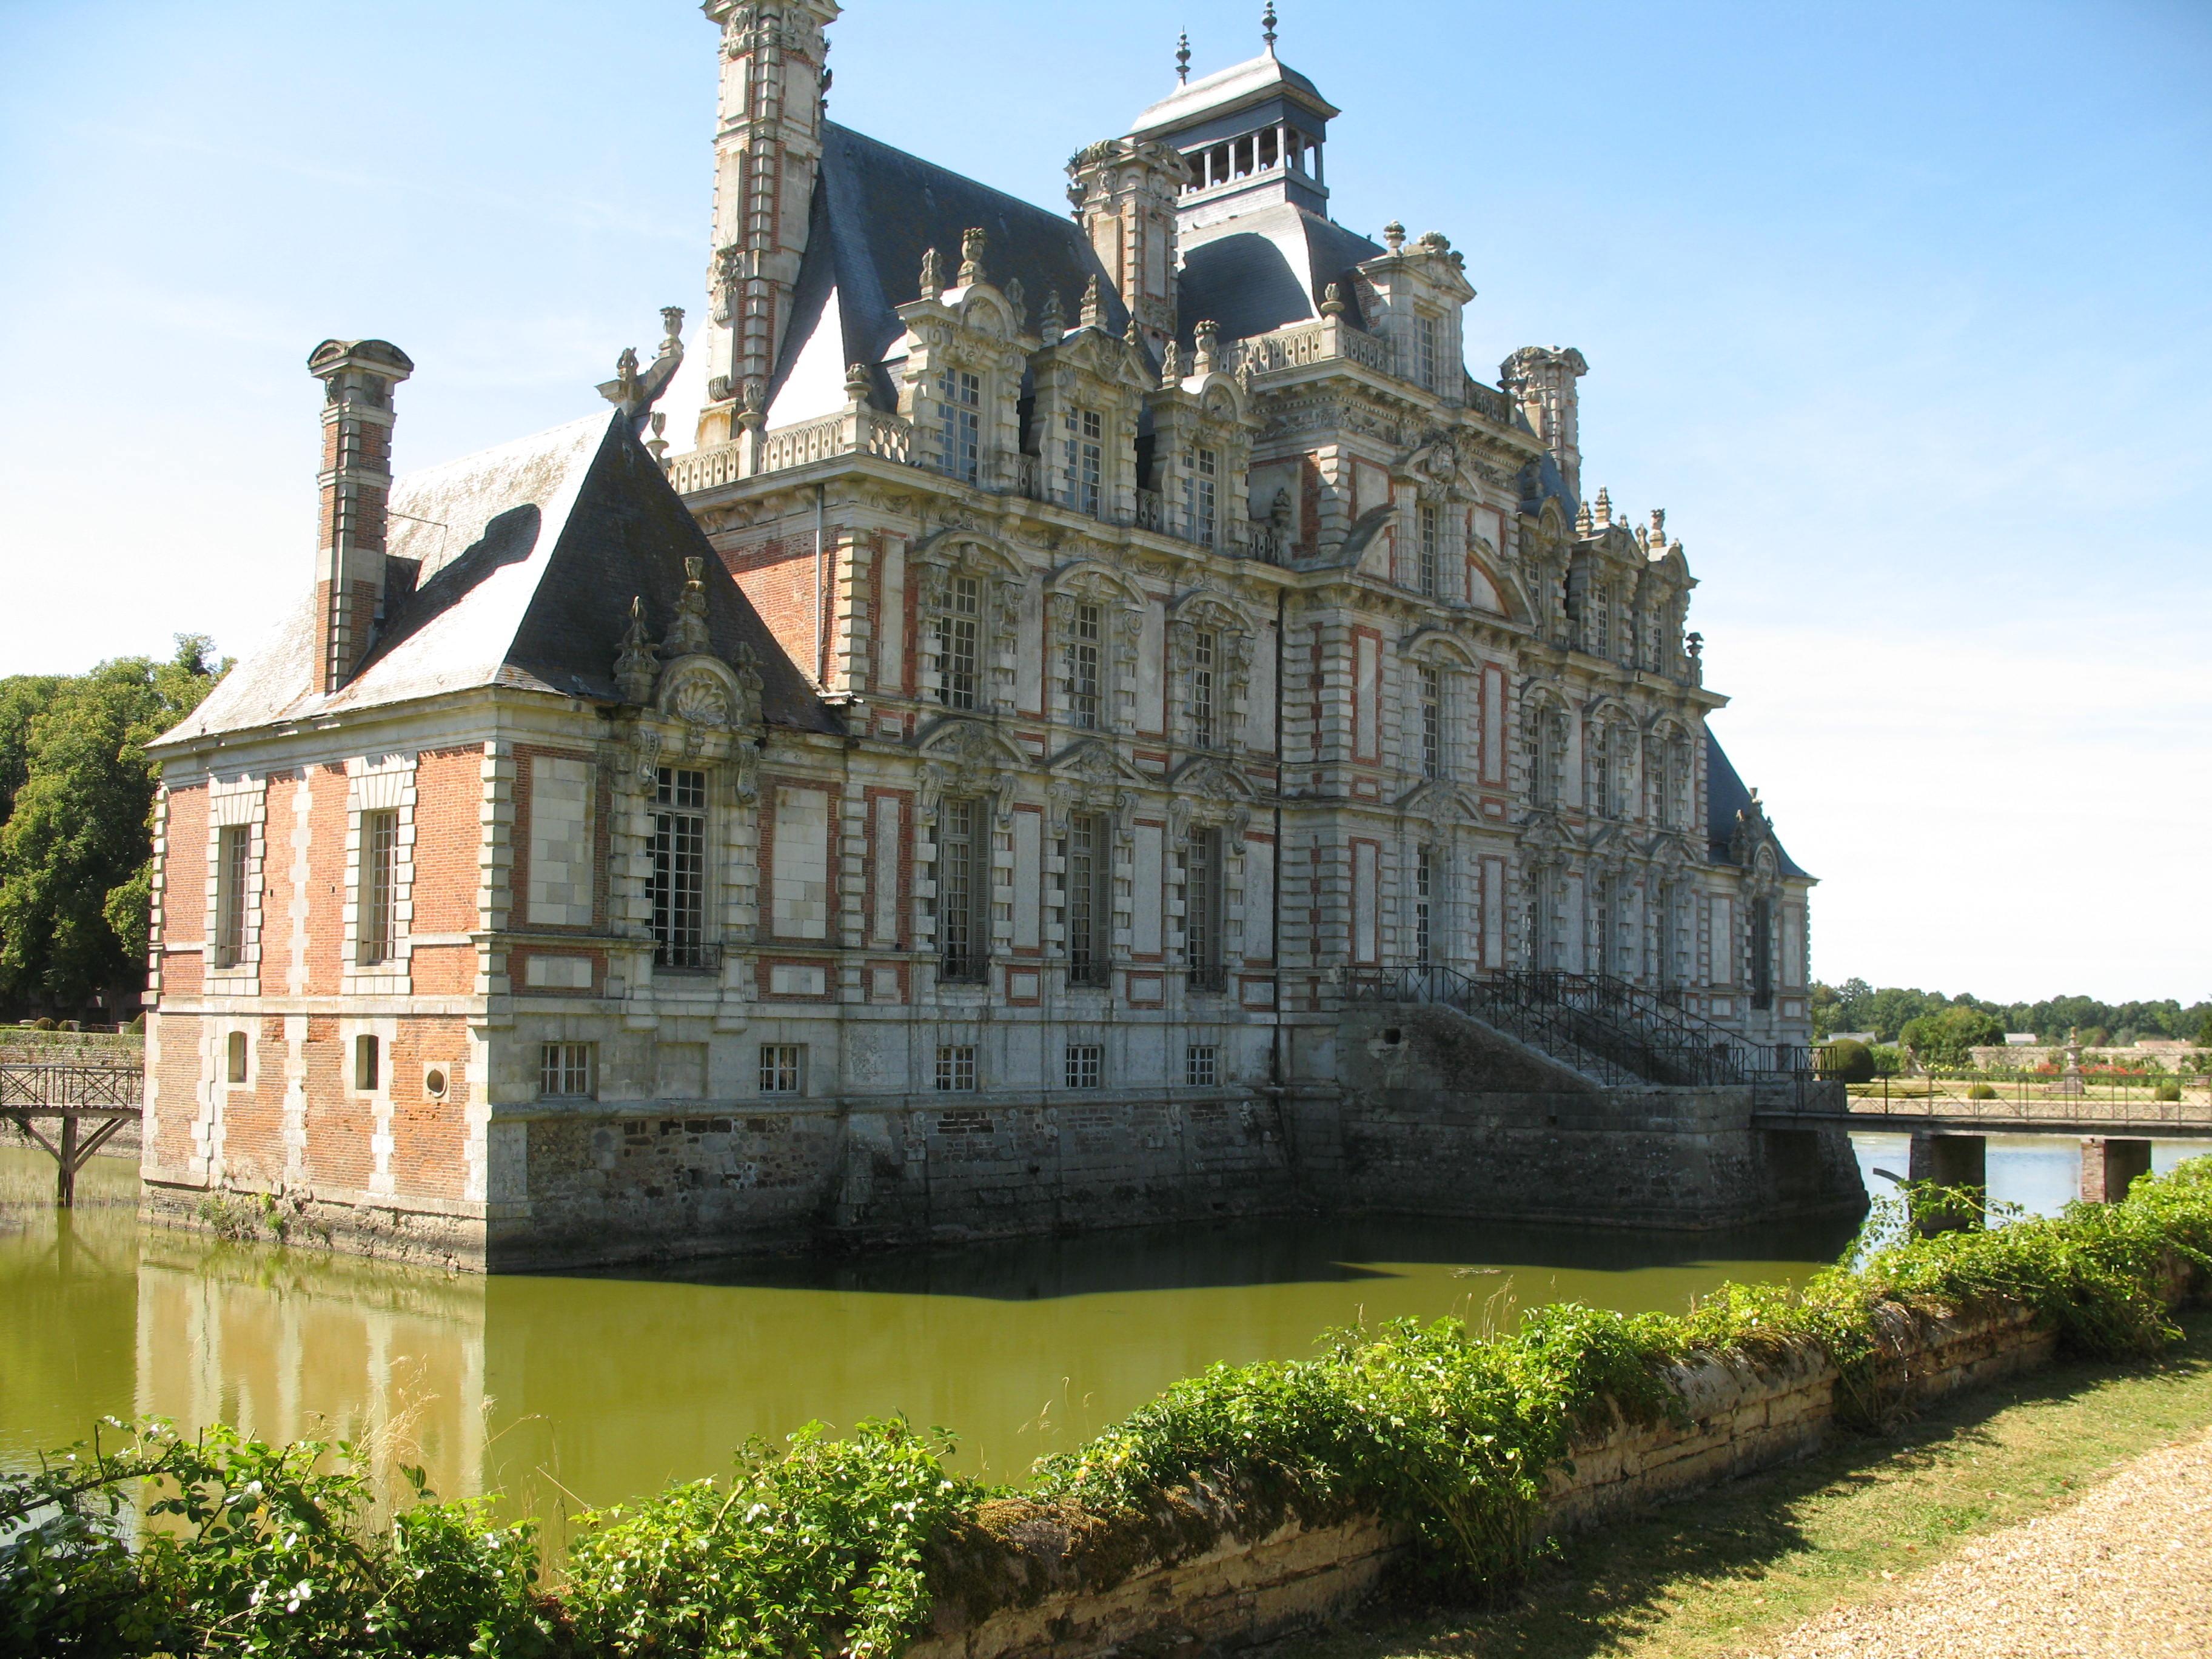 789-chateau_de_beaumesnil_eure.jpg